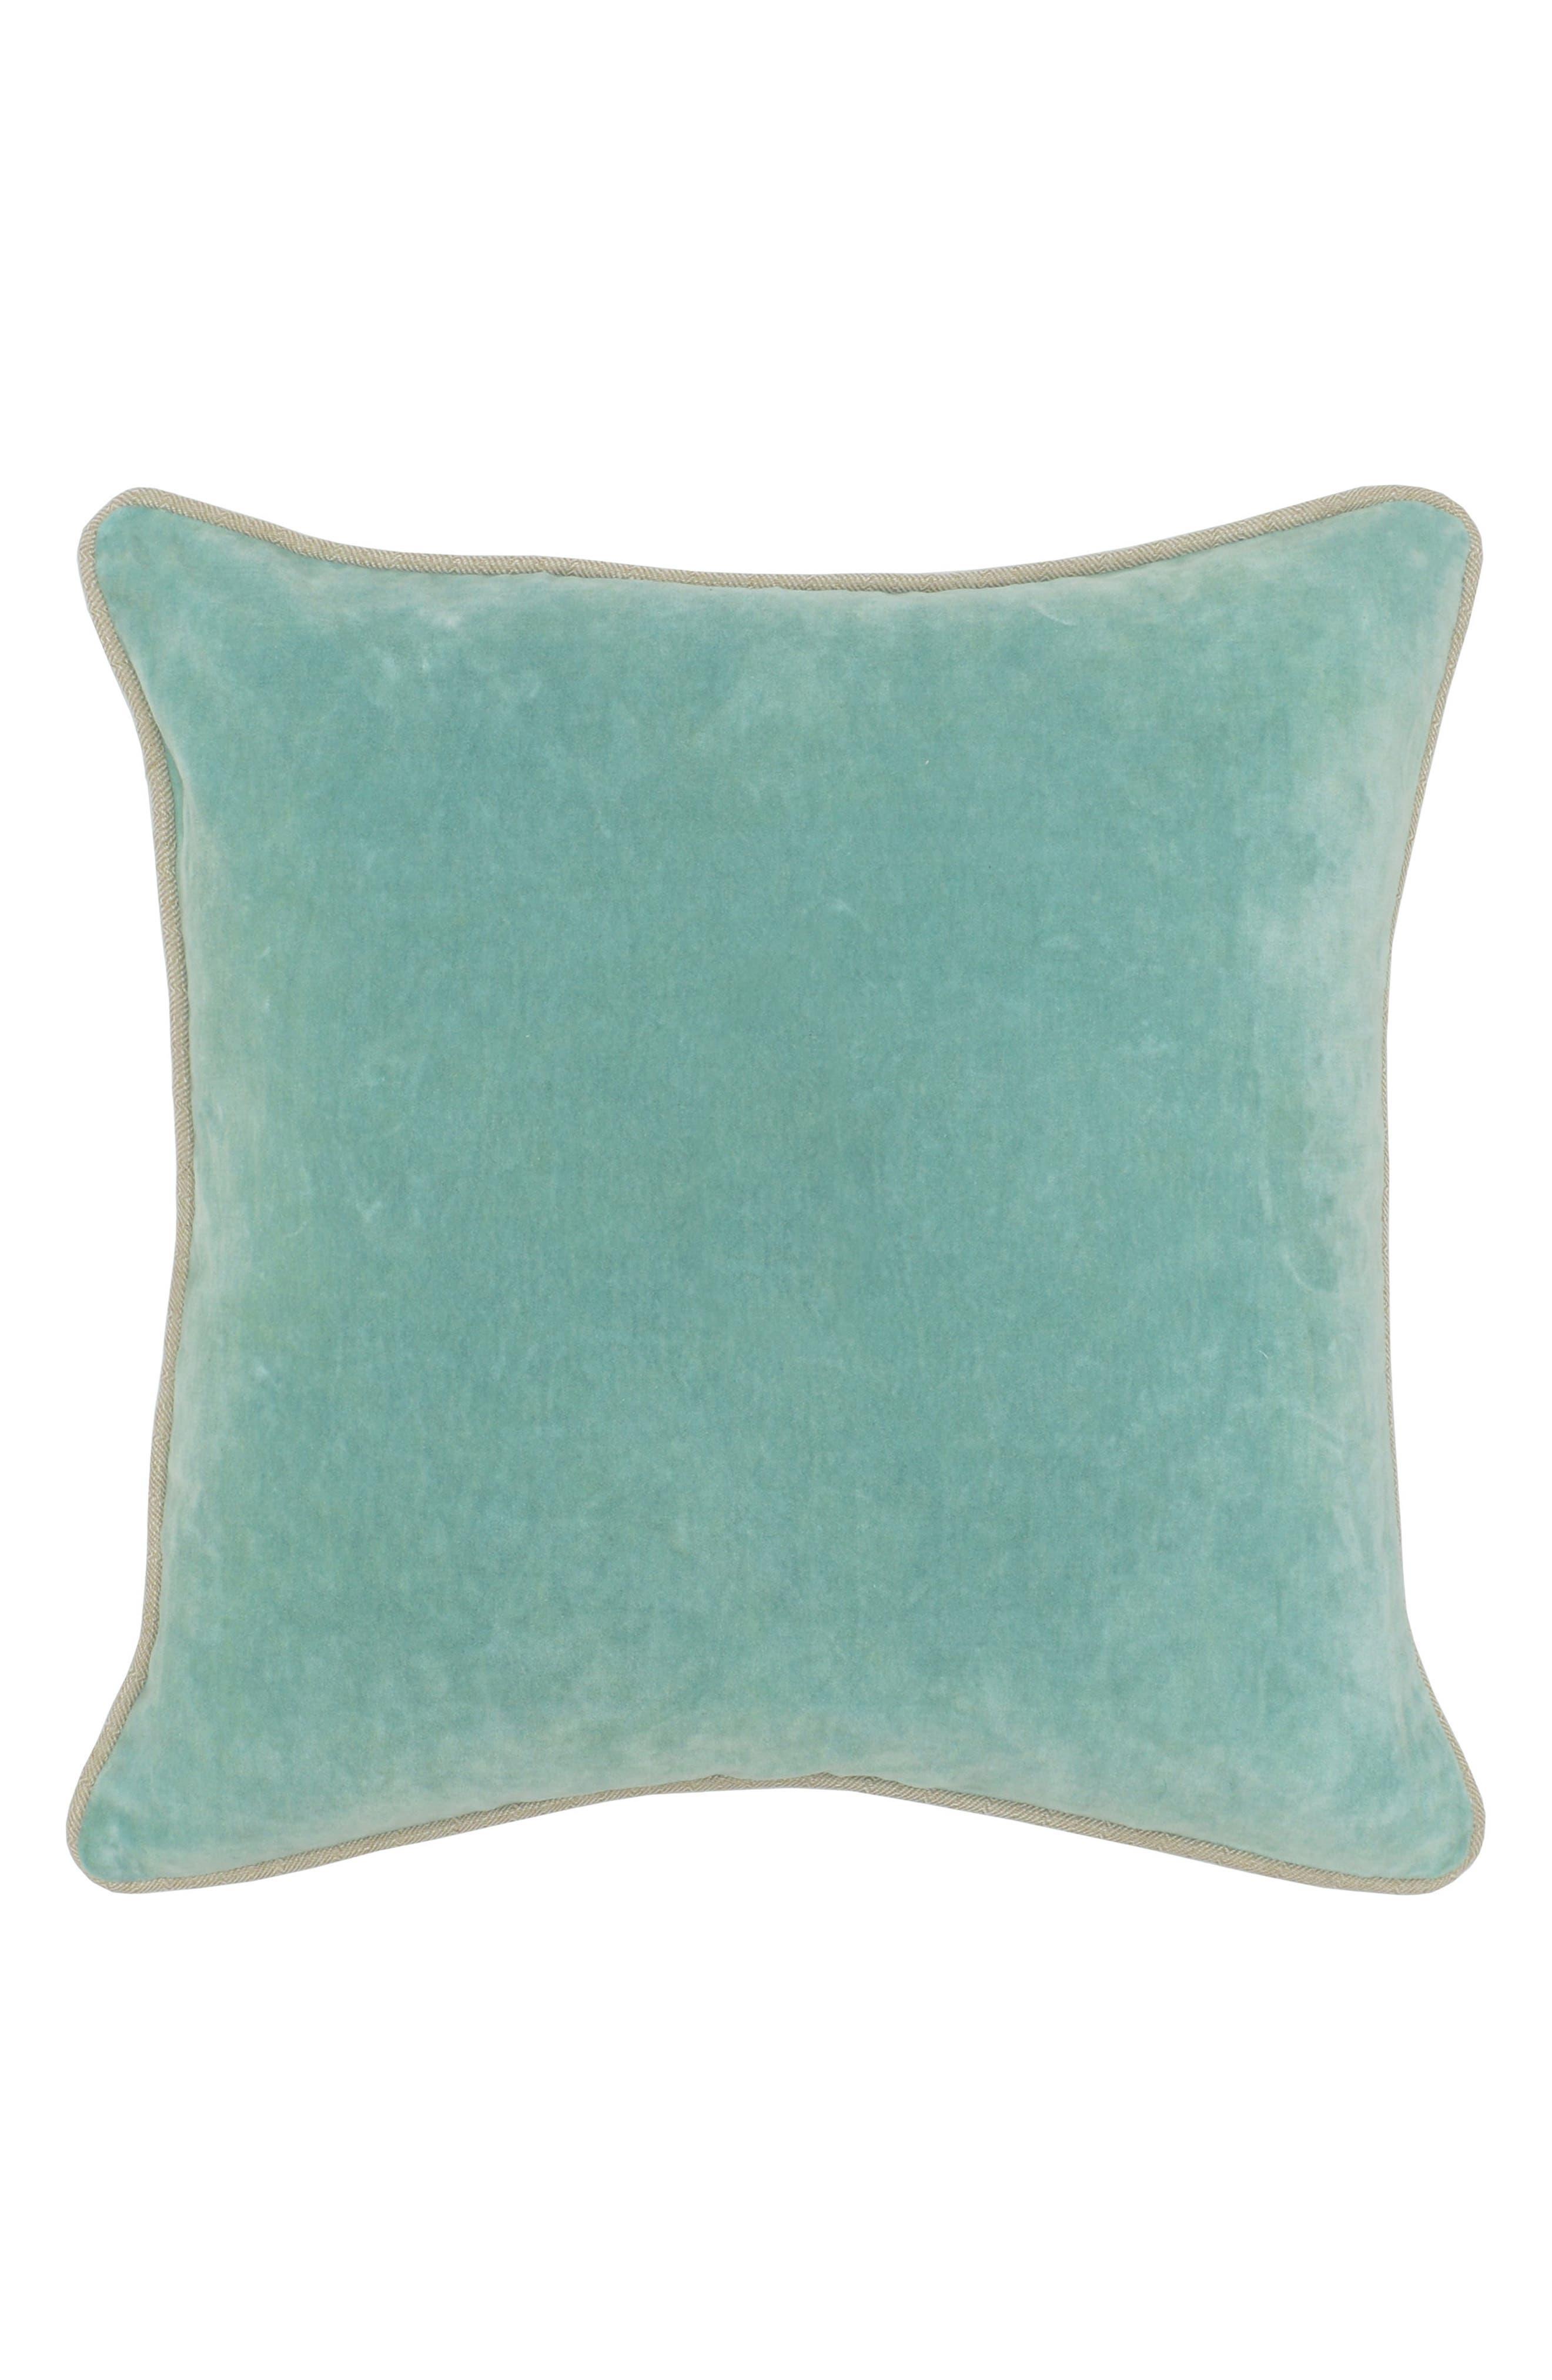 Heirloom Velvet Accent Pillow,                         Main,                         color, 400